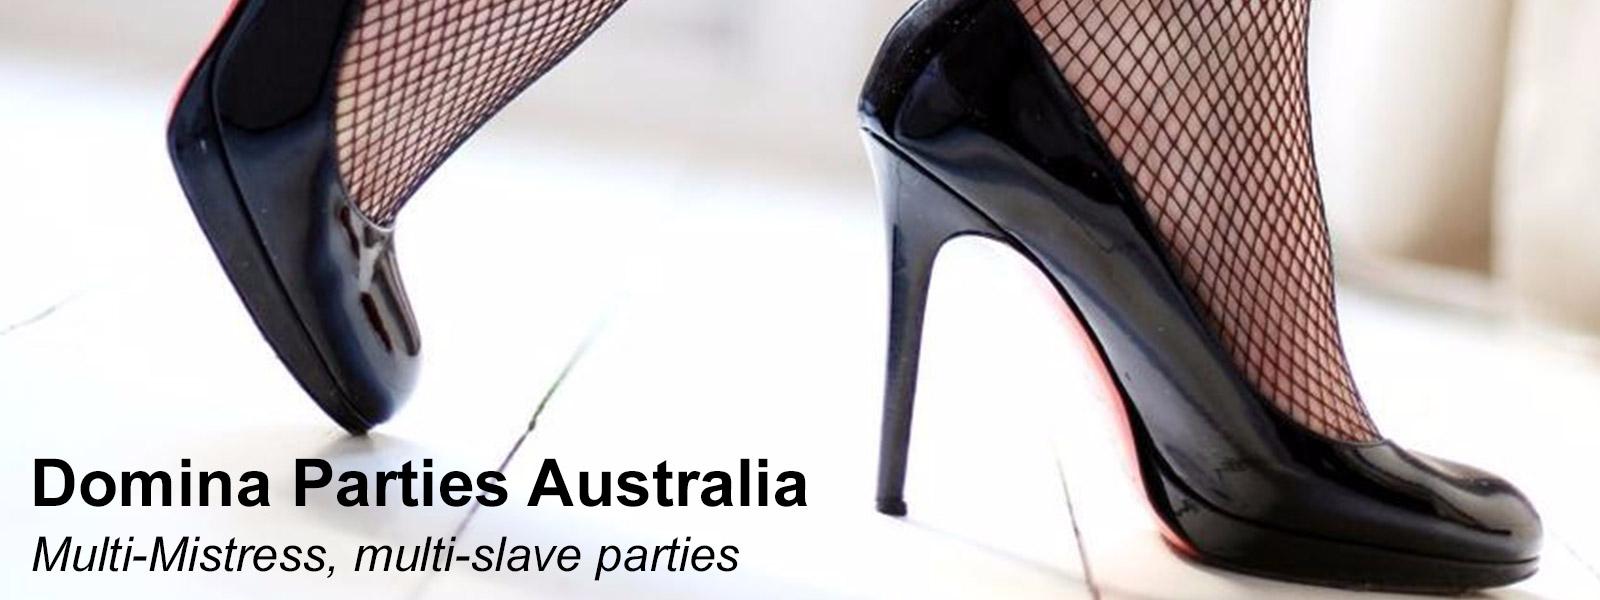 Domina Parties Australia